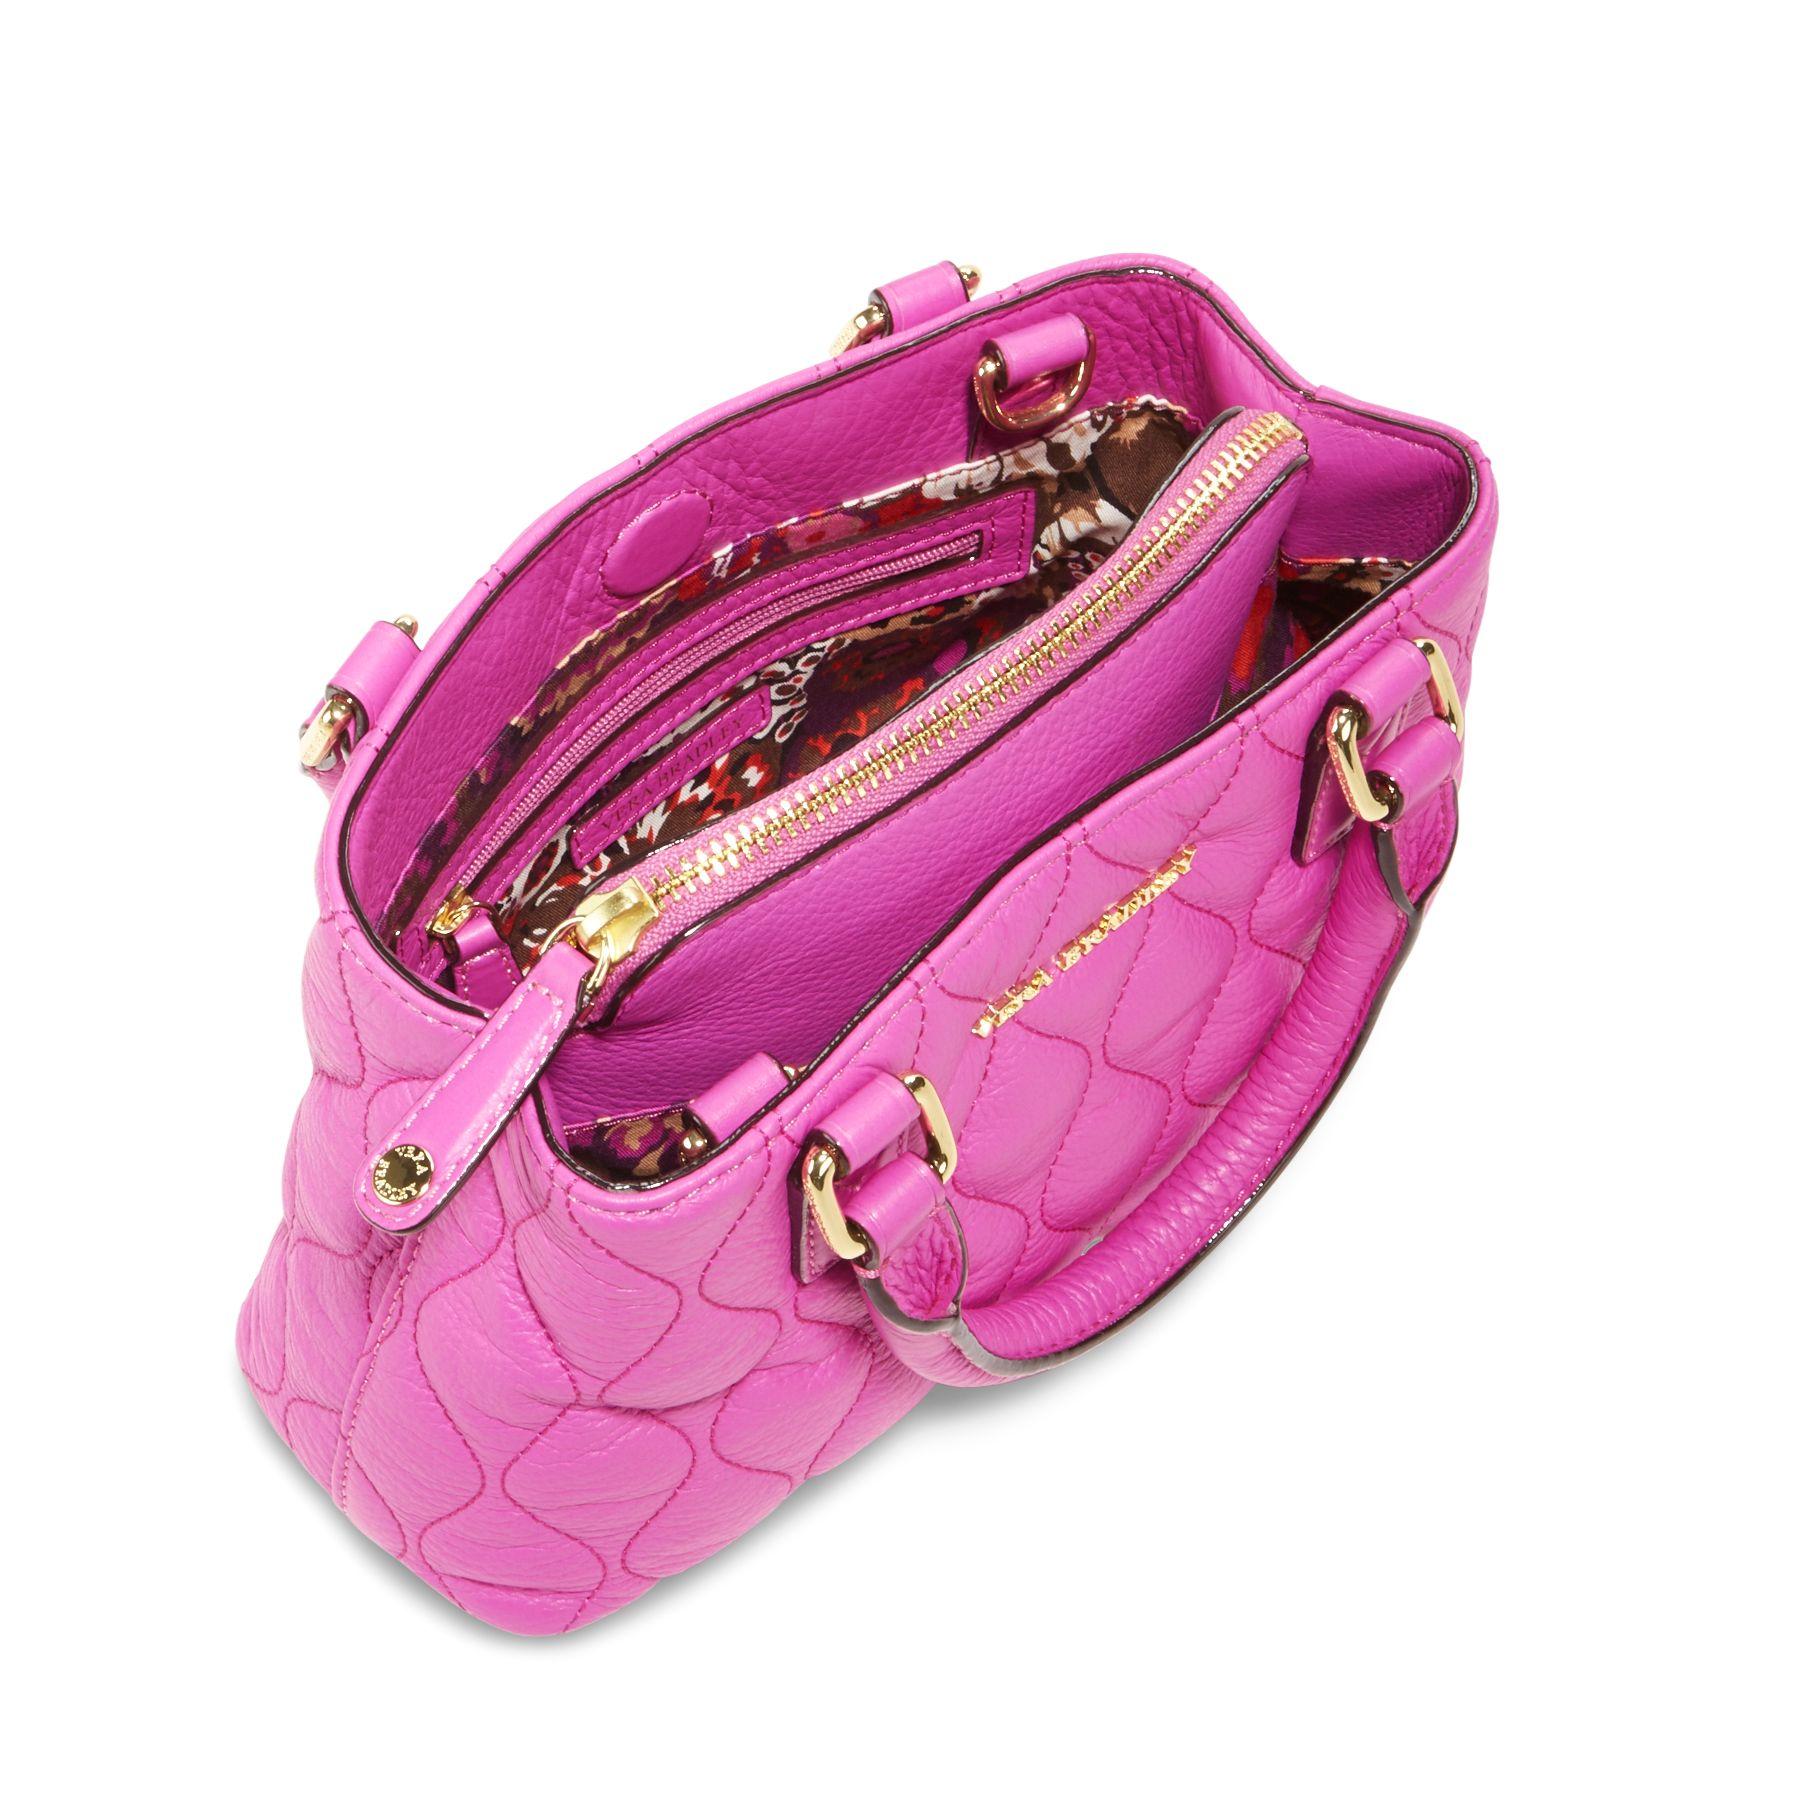 Vera Bradley Quilted Leather Emma Mini Crossbody Bag